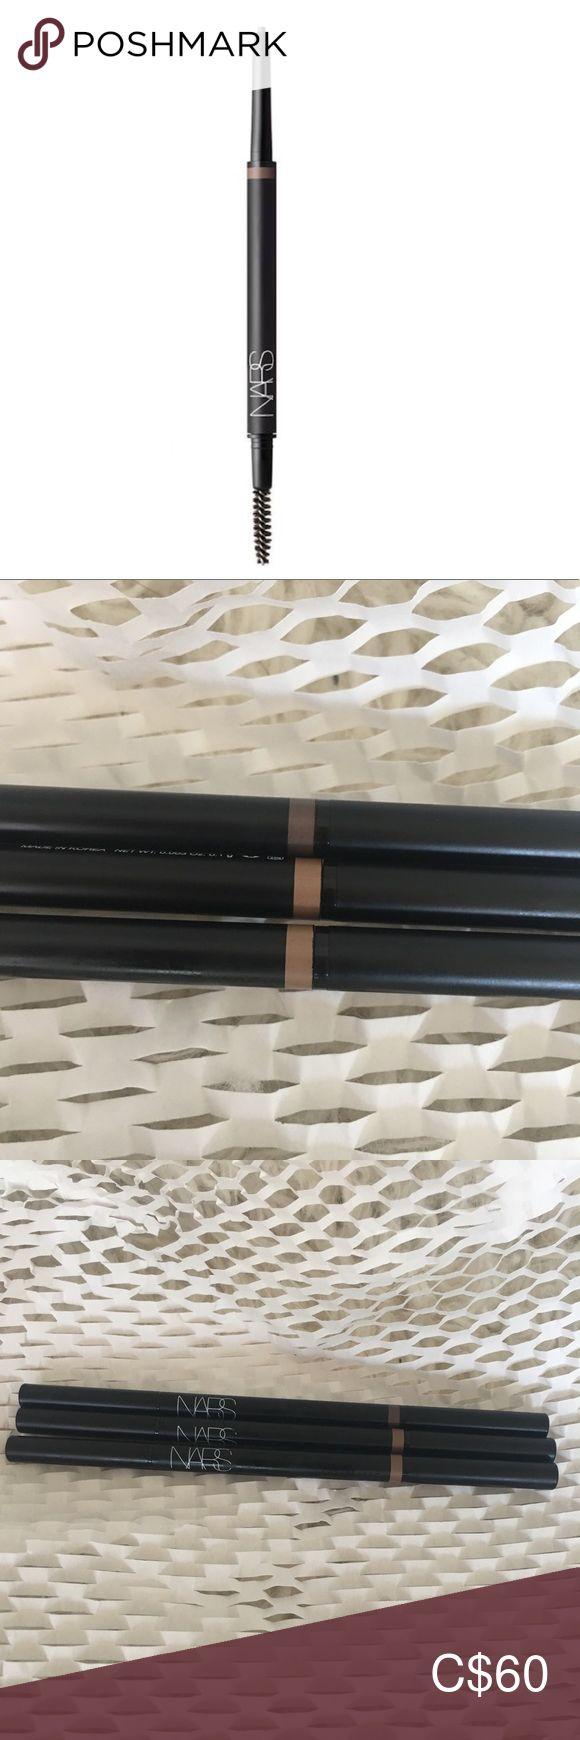 3 Nars Brow Perfector Eyebrow Pencils Unused set o…